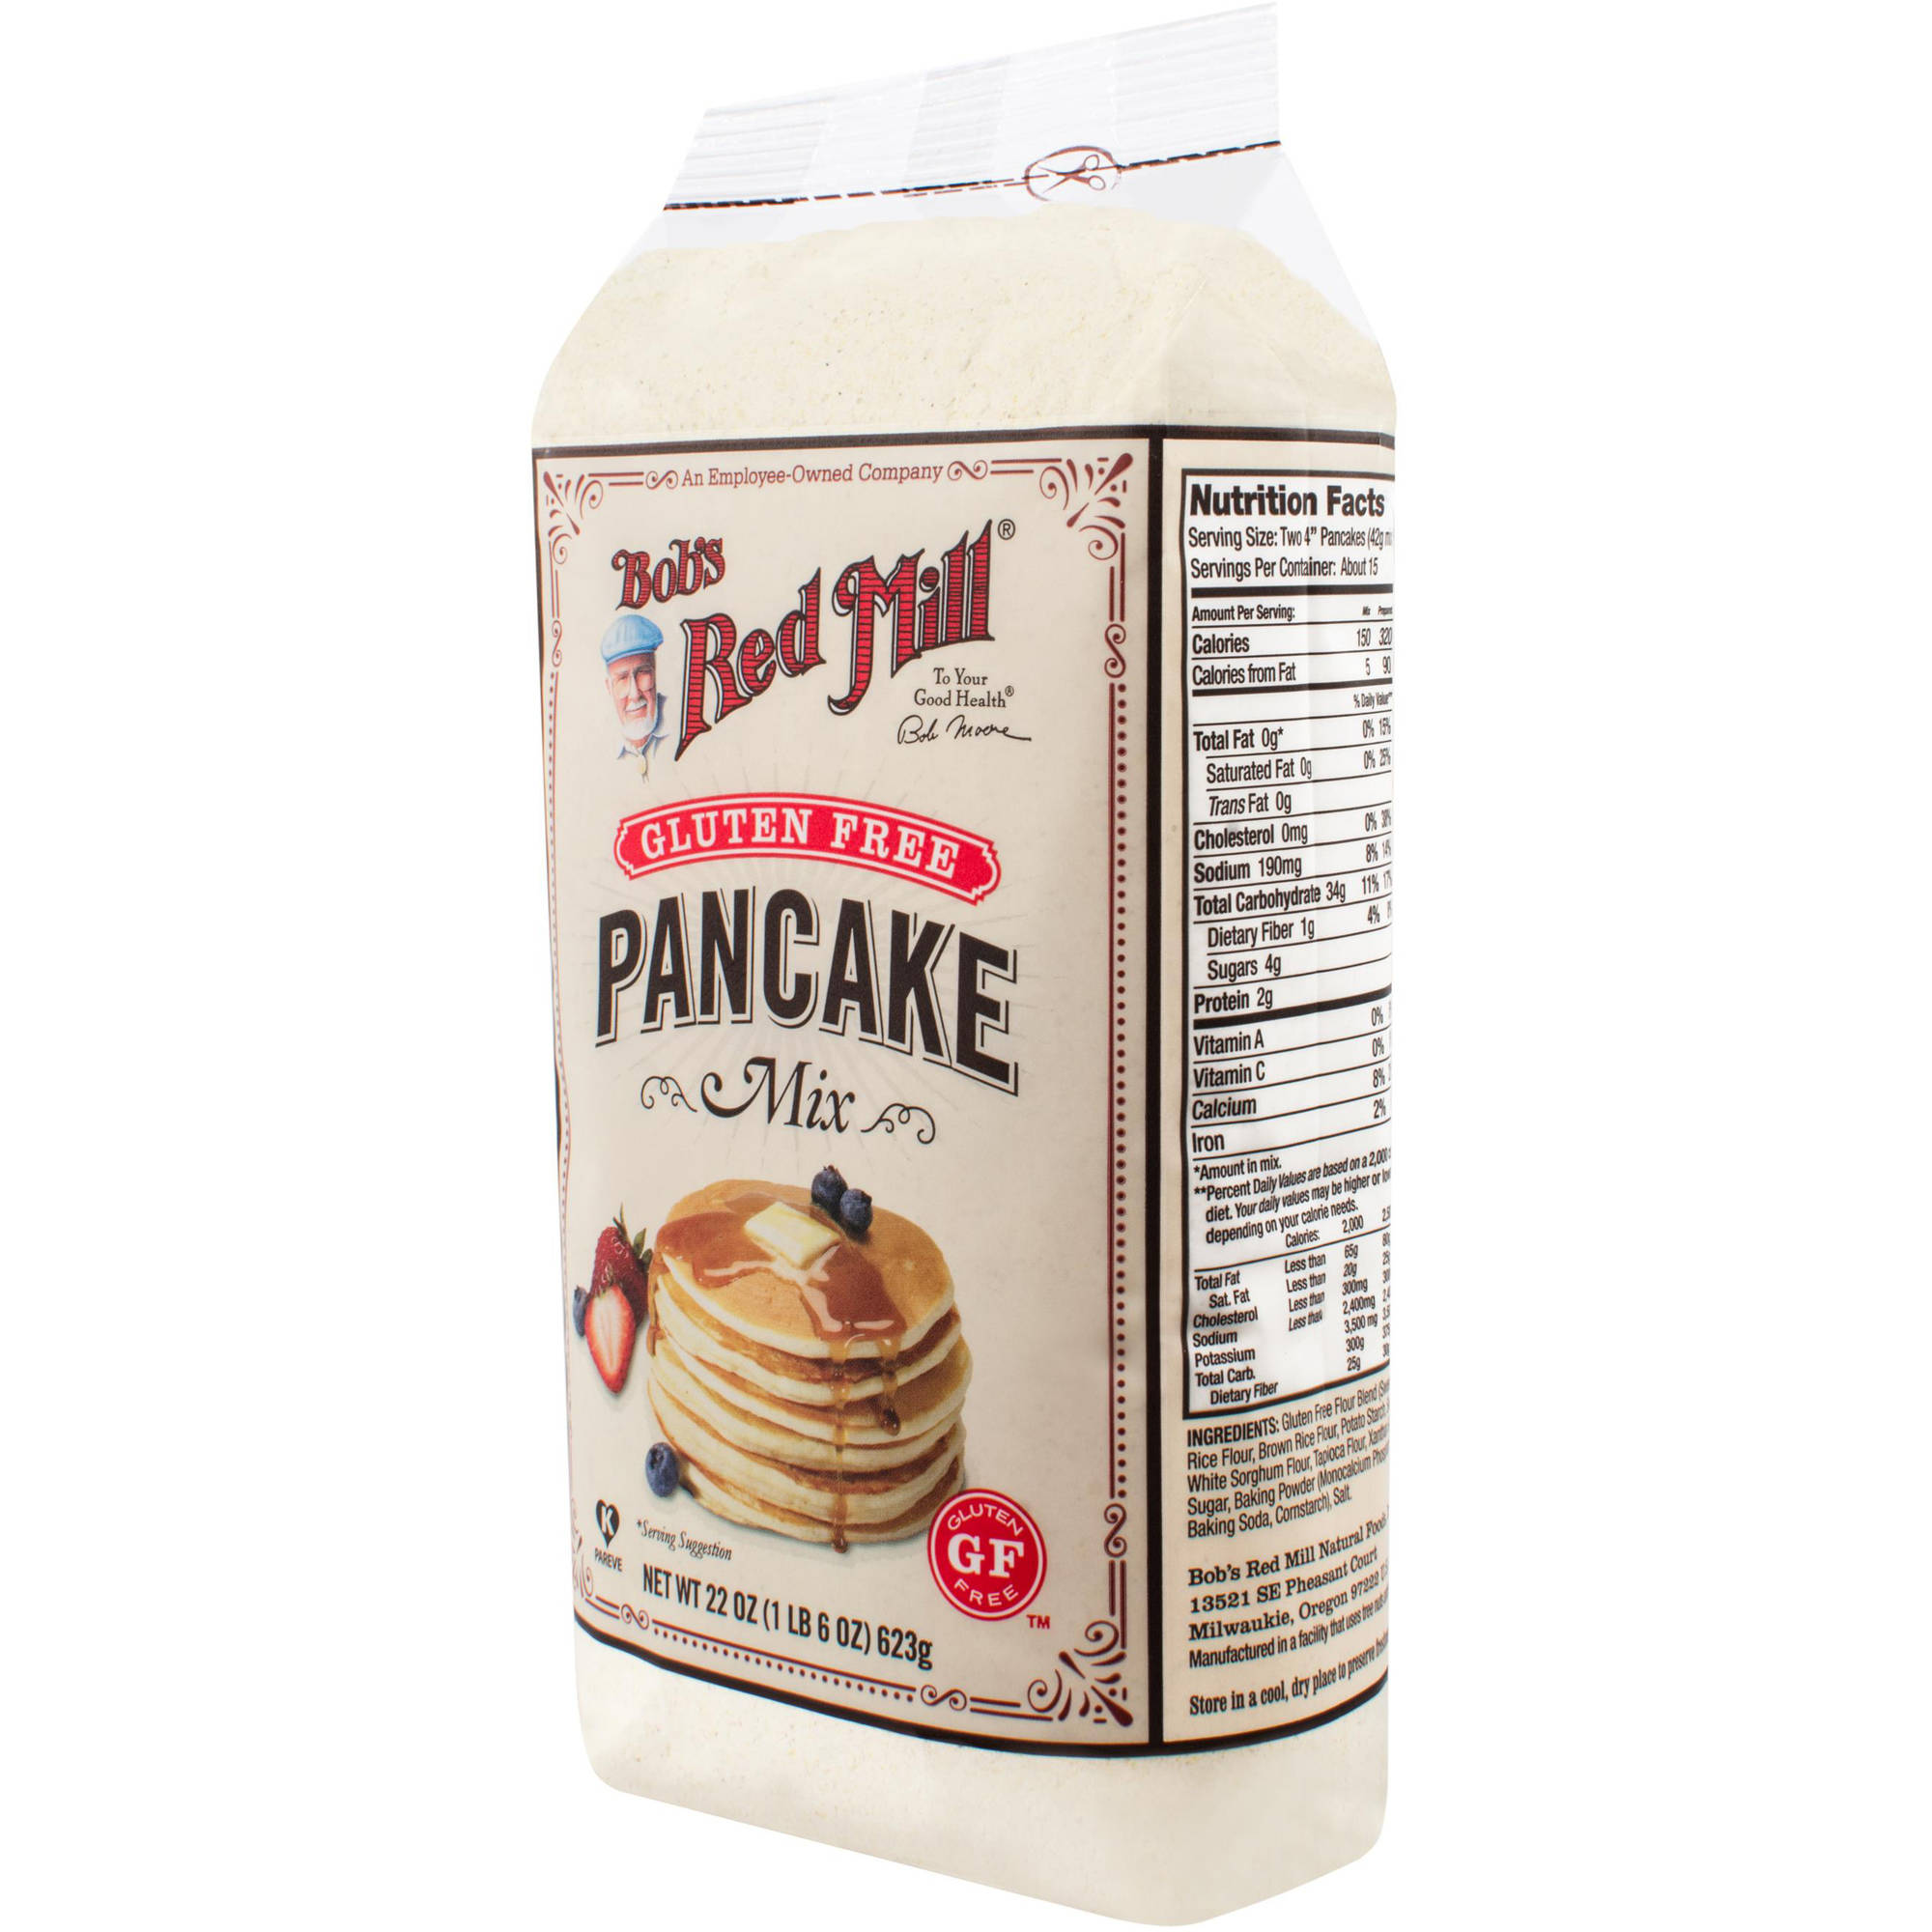 Bob's Red Mill Gluten-Free Pancake Mix, 22 oz, (Pack of 4)